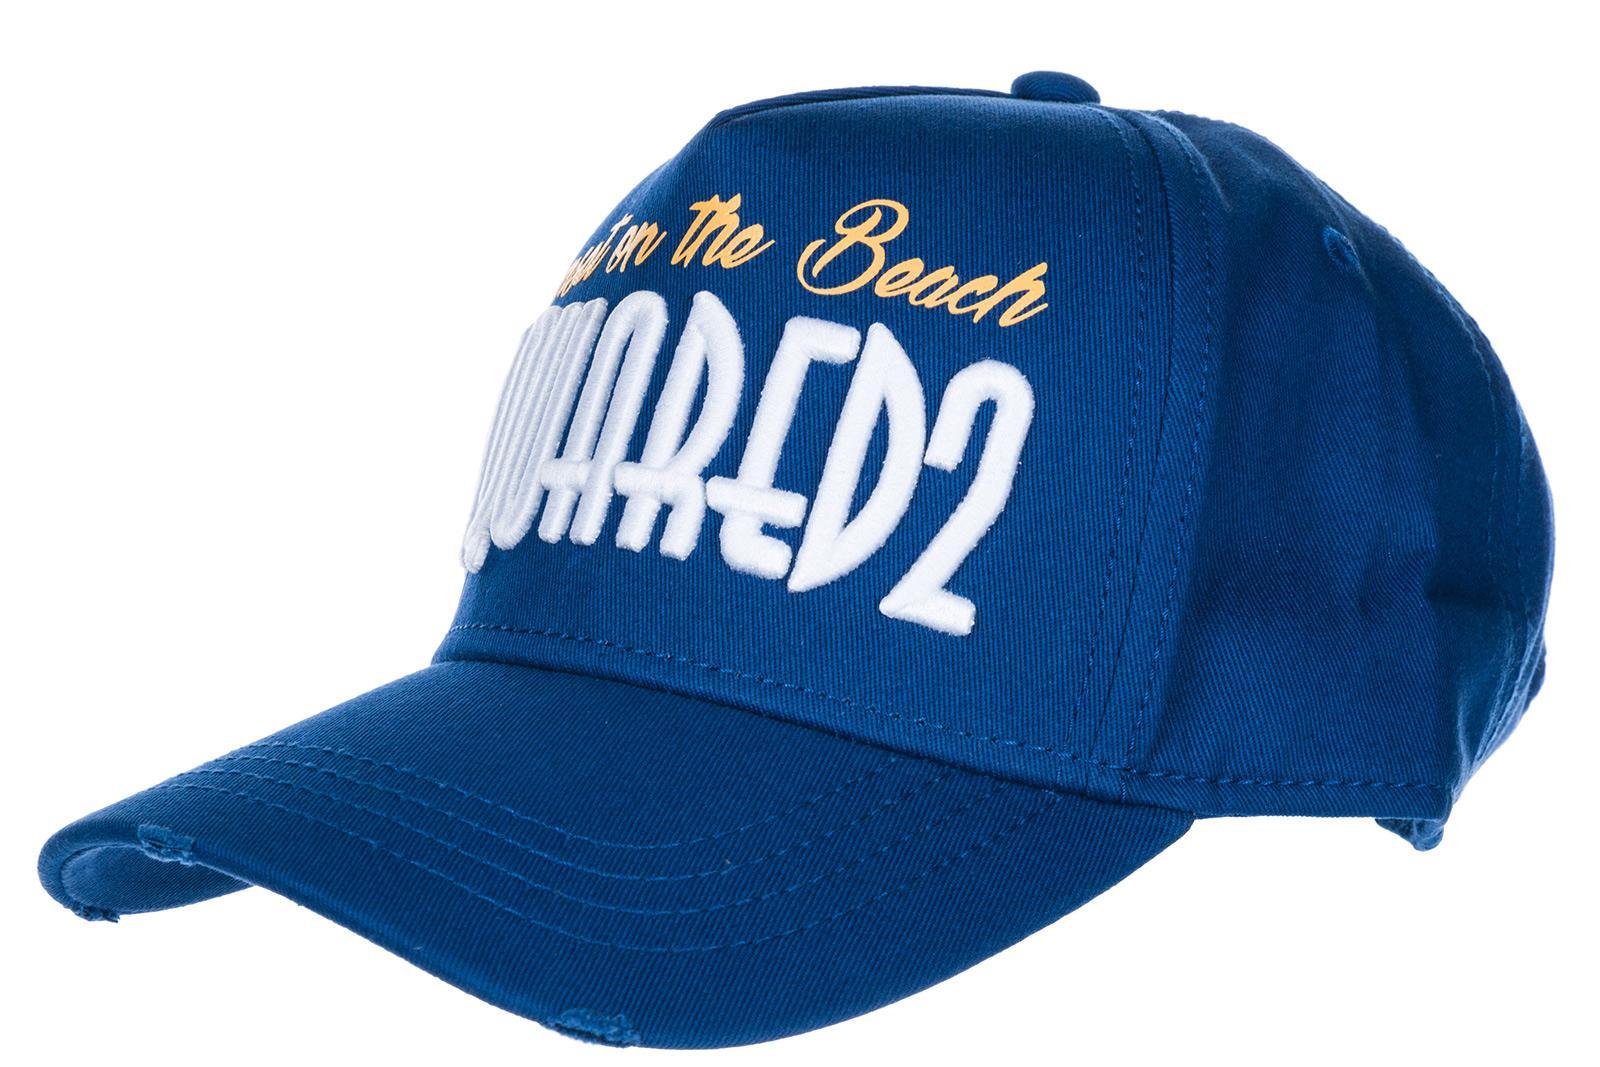 Dsquared2 Adjustable Men's Cotton Hat Baseball Cap Baseball In Blue